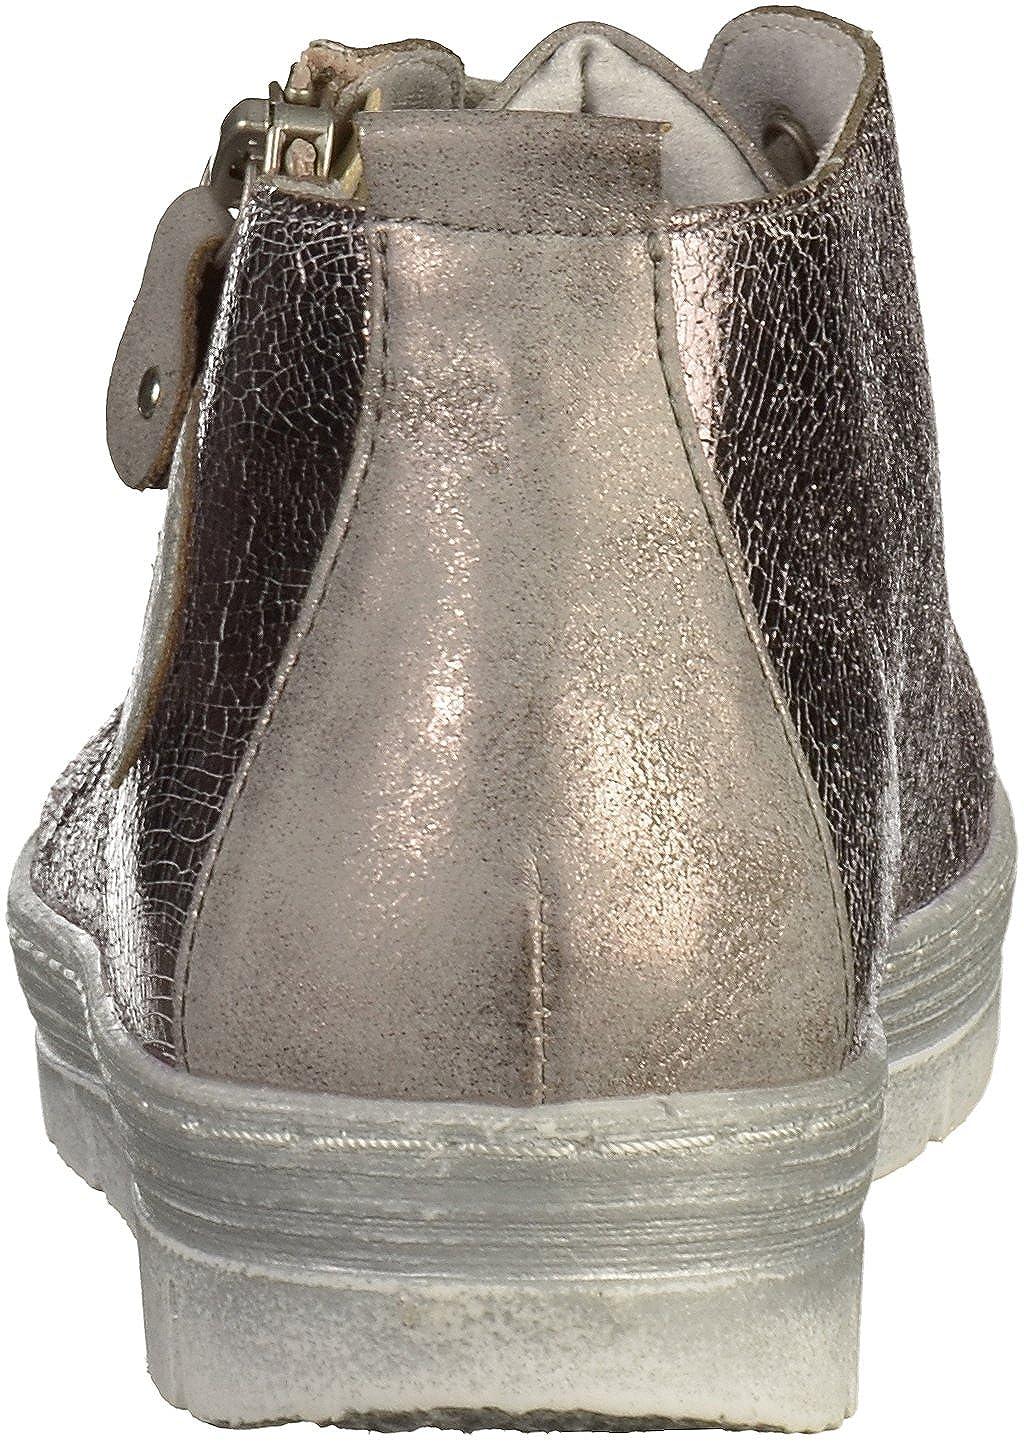 et femmes Baskets Chaussures Sacs D5870 Remonte xvAqYY